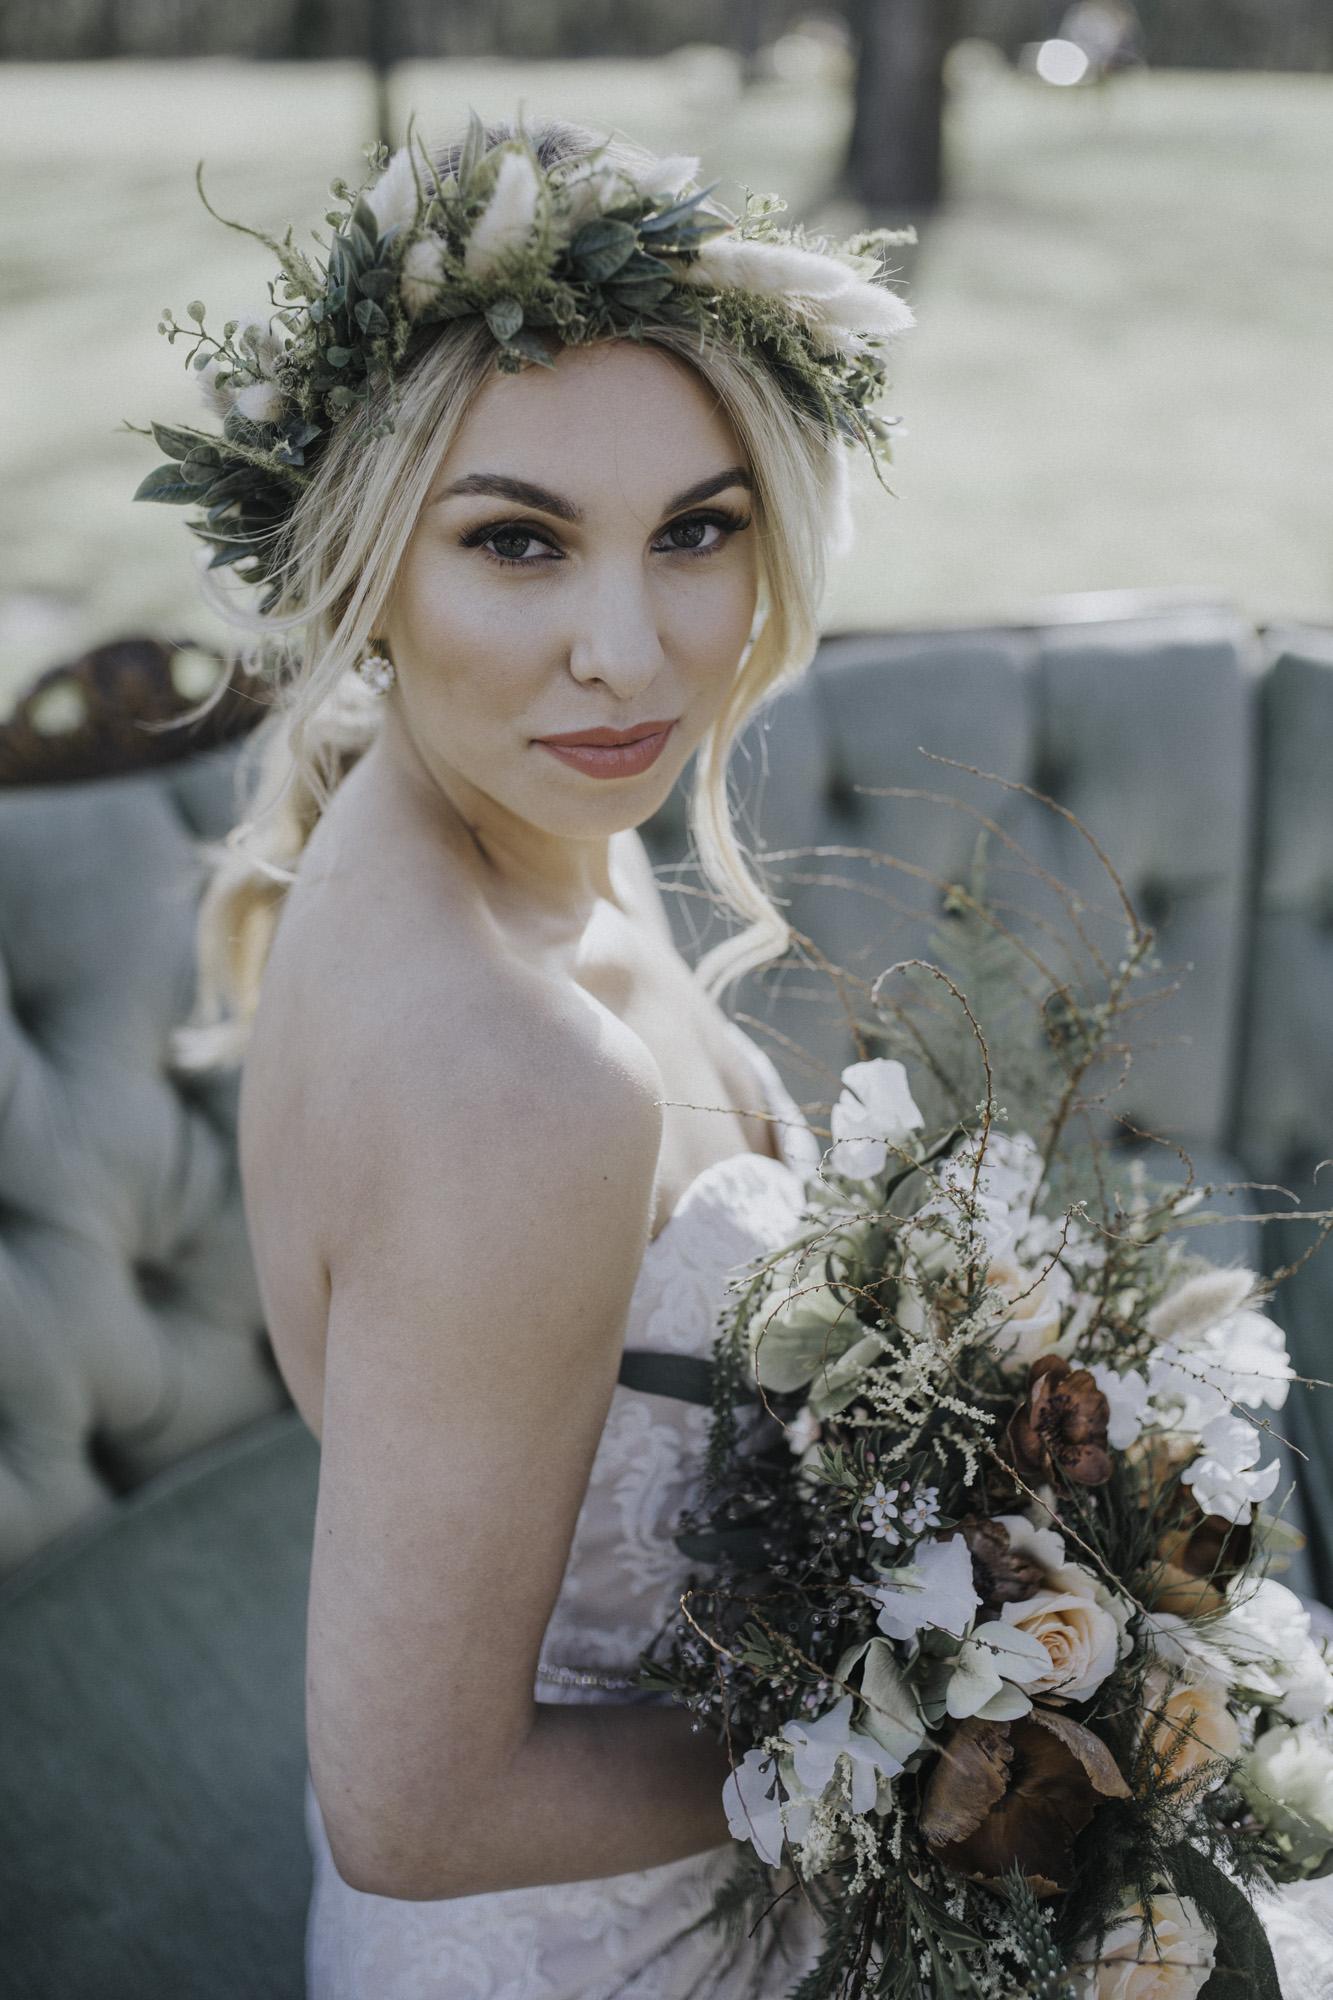 Cate_Ann_Photography_Dayton_Ohio_Wedding_Elopement_And_Engagement_PhotographerIMG_8616.jpg